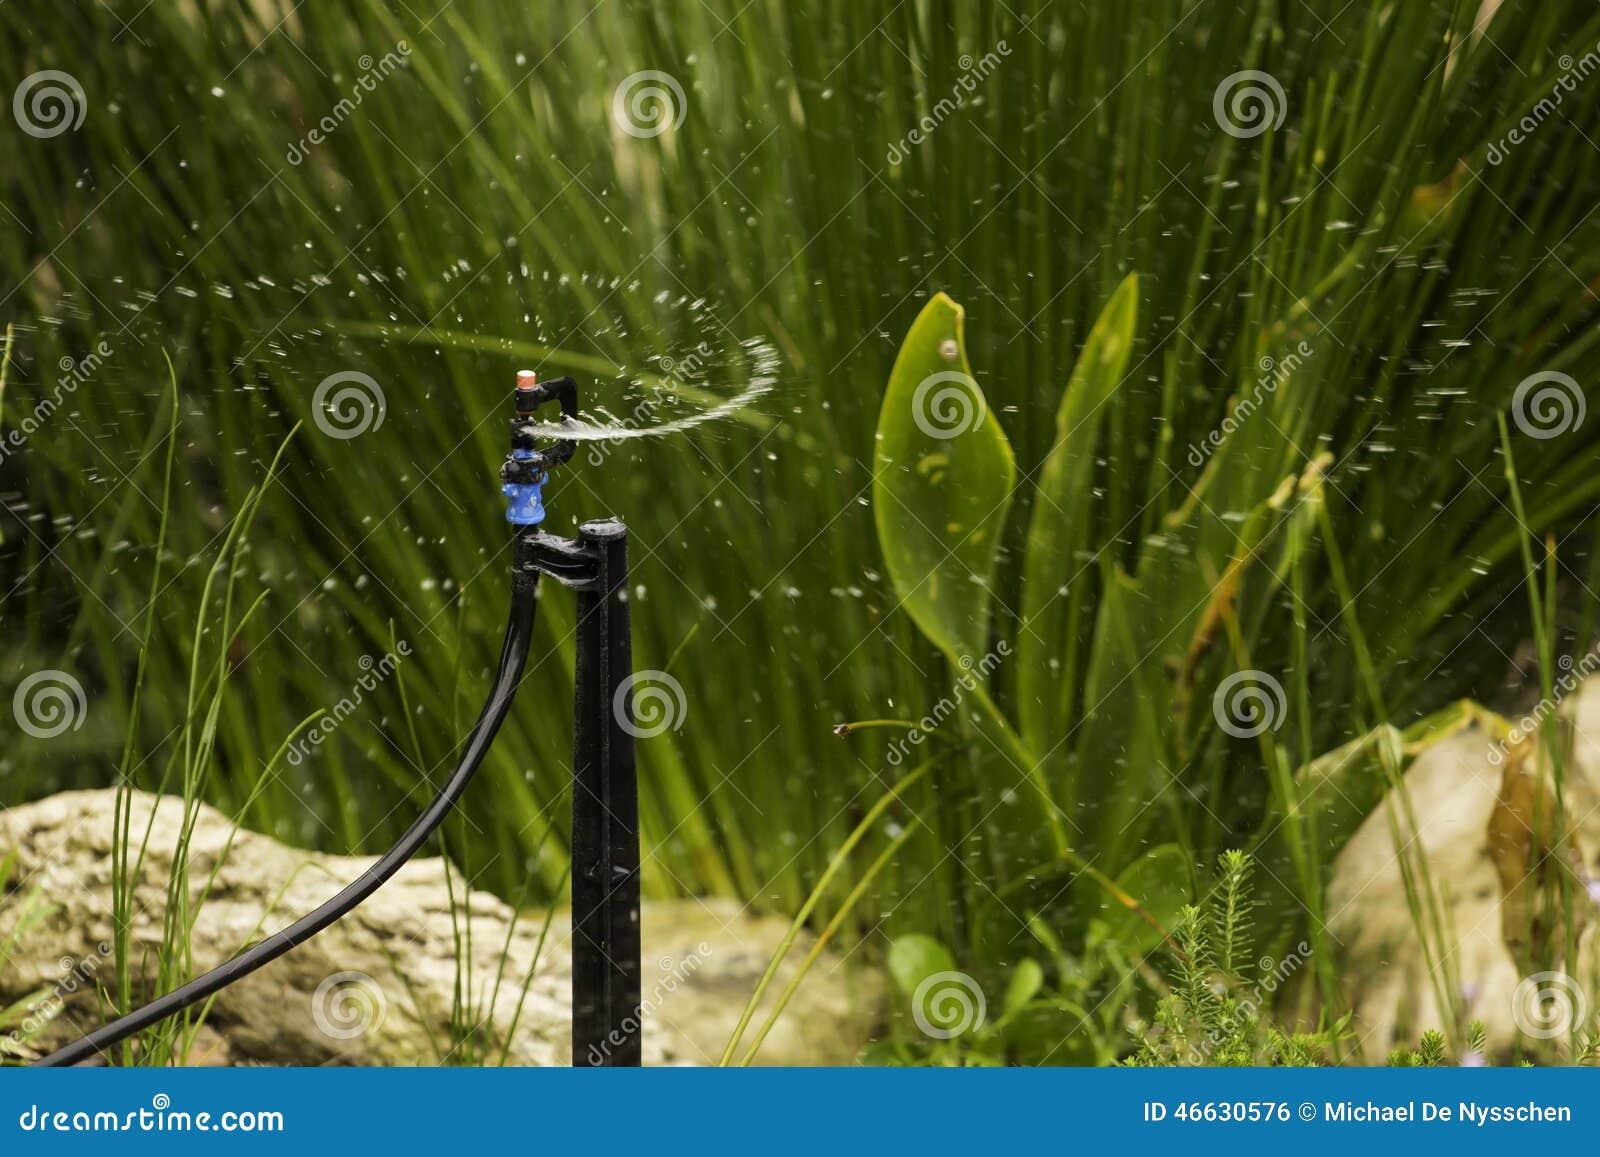 Sprinkler System Spraying Water Garden Stock Photo - Image ...